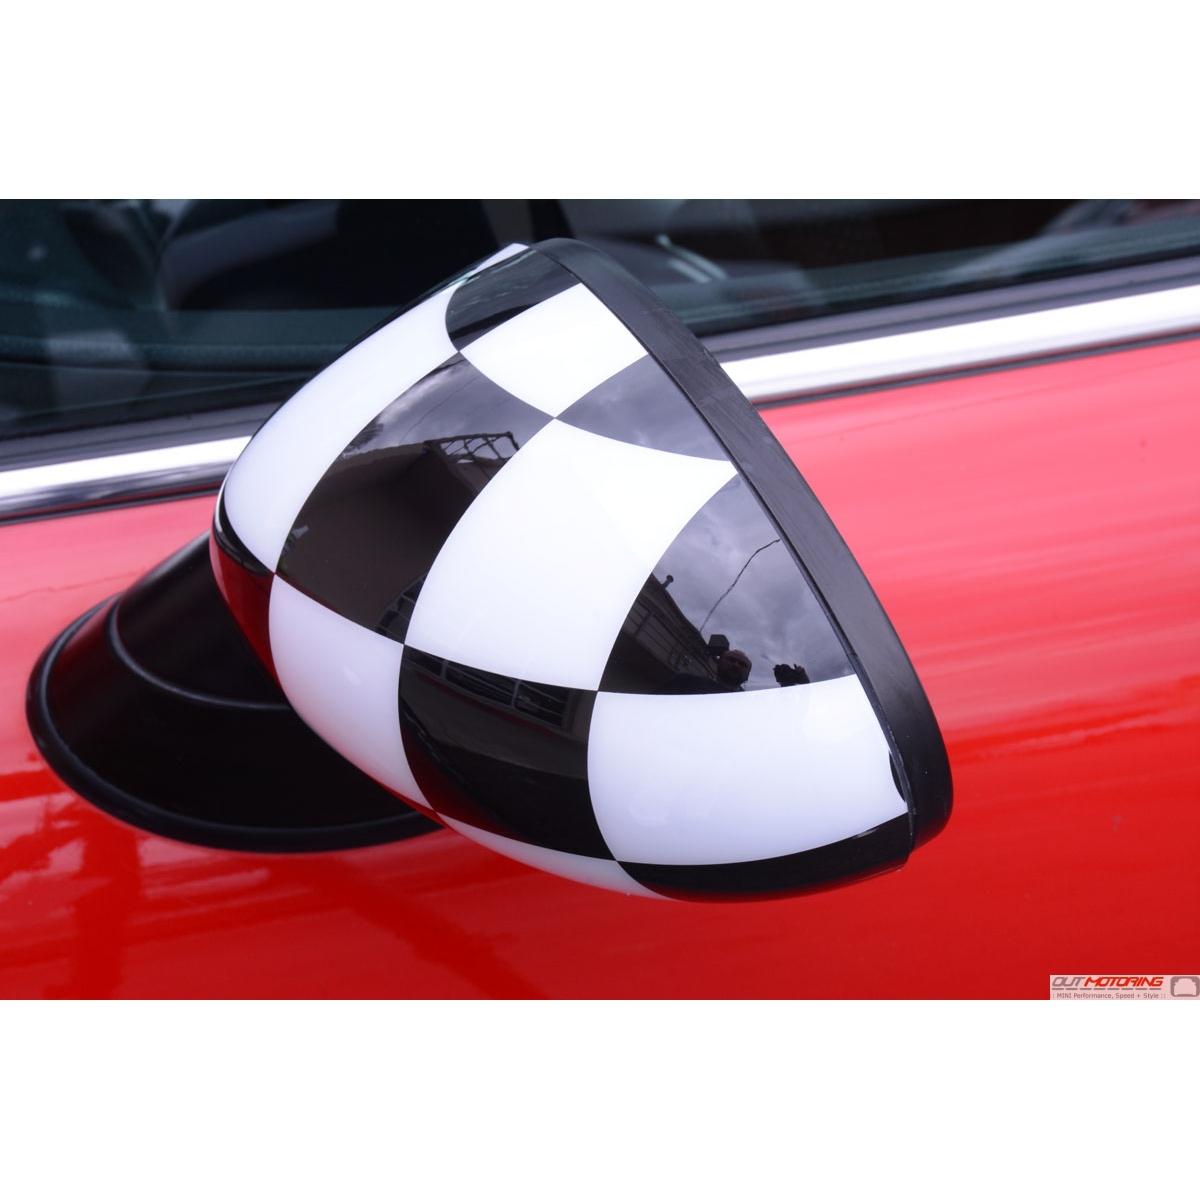 Mini Cooper Checkered Flag Mirror Covers Stick On Gen1